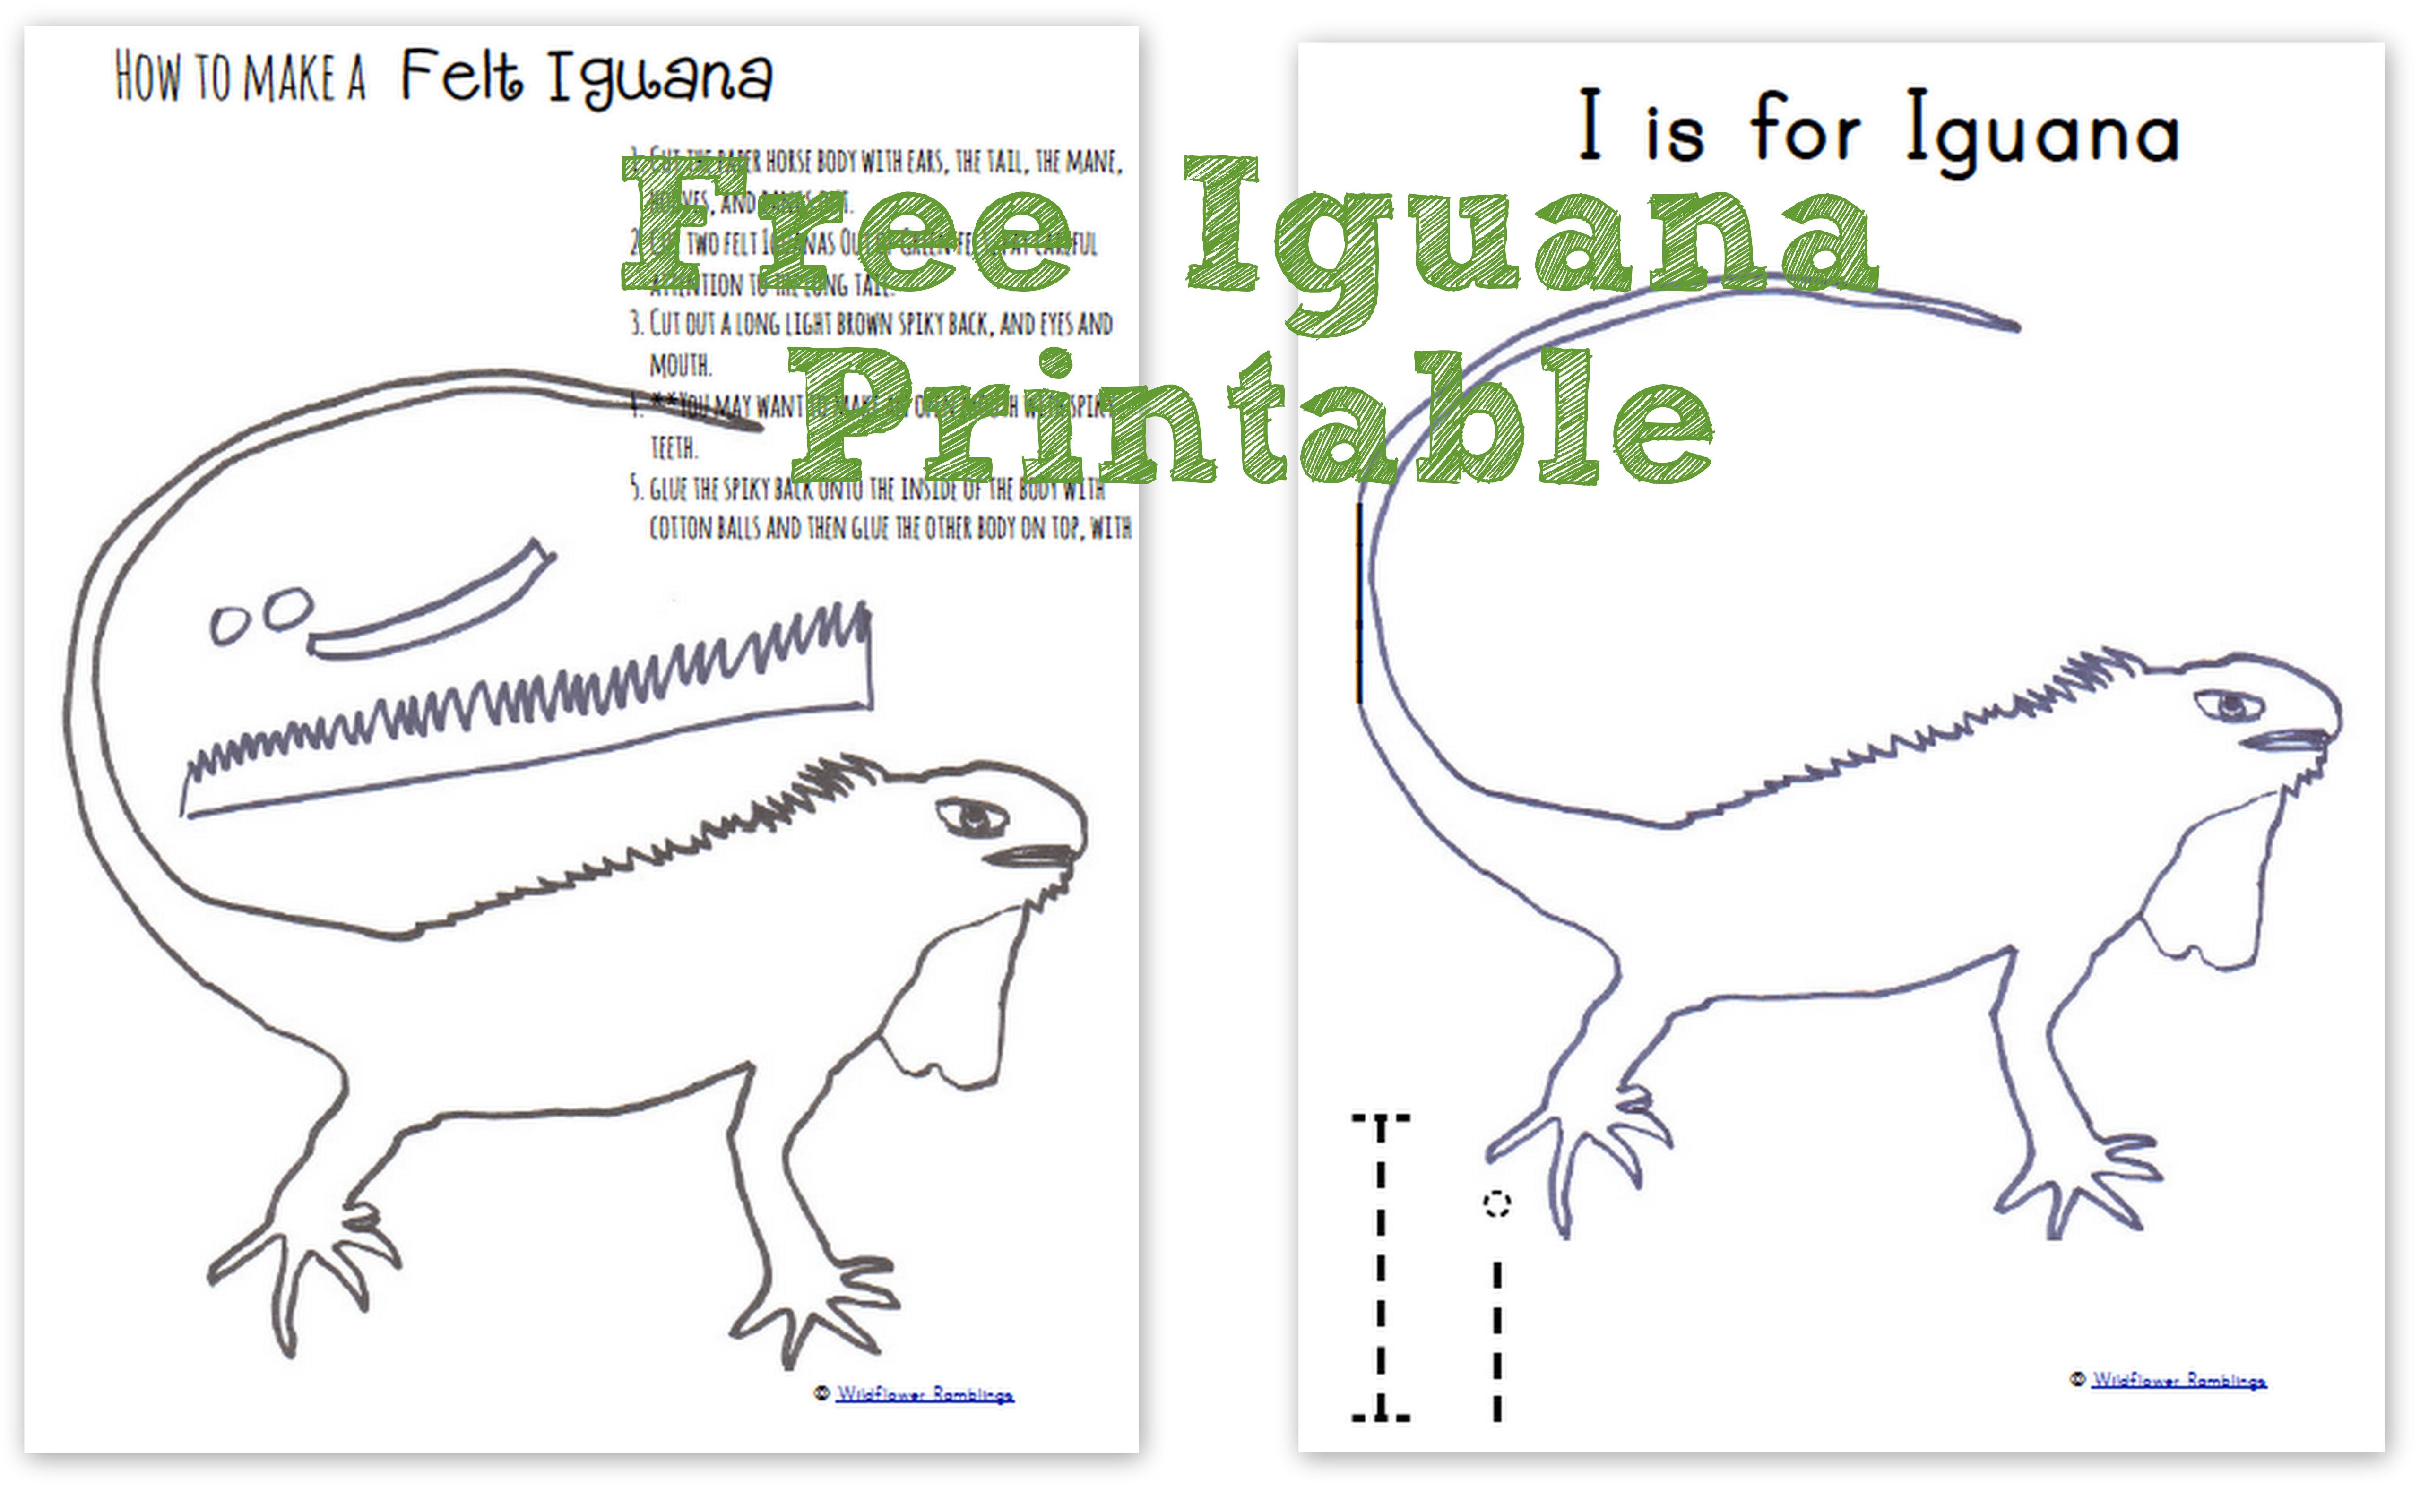 How To Make A Felt Iguana